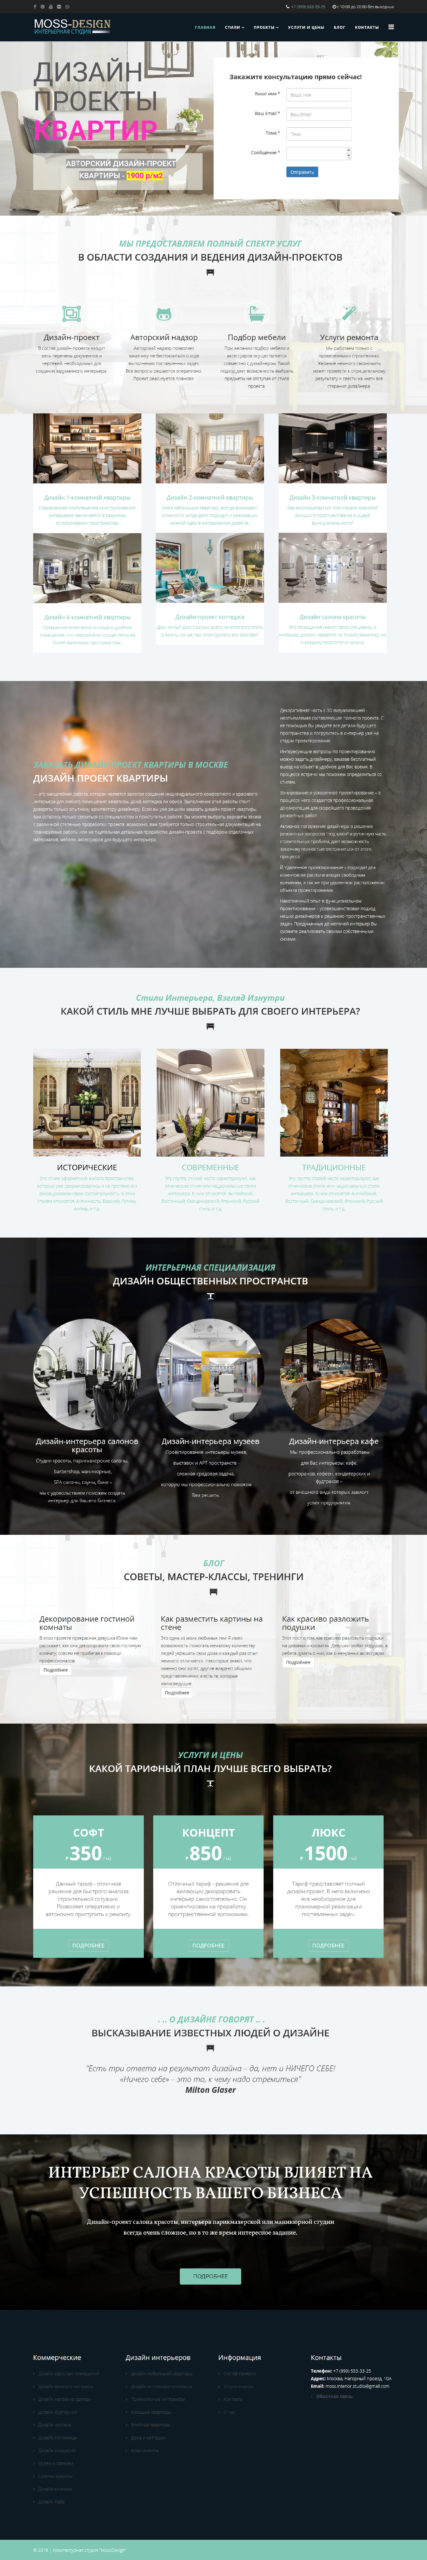 "Архитектурная студия ""MossDesign"""